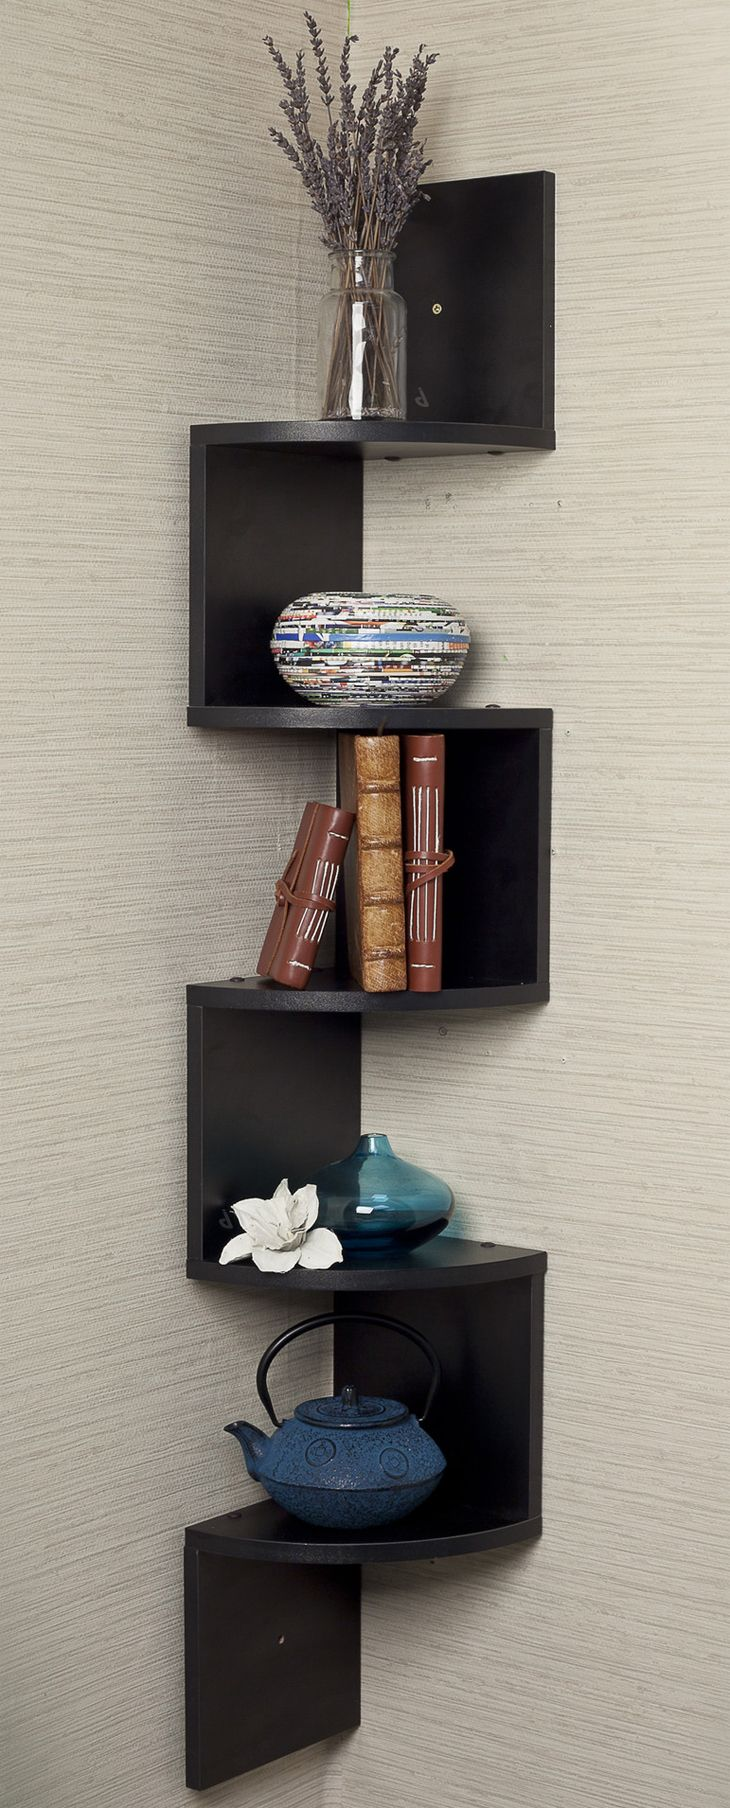 Zig zag corner wall shelf // clever design!